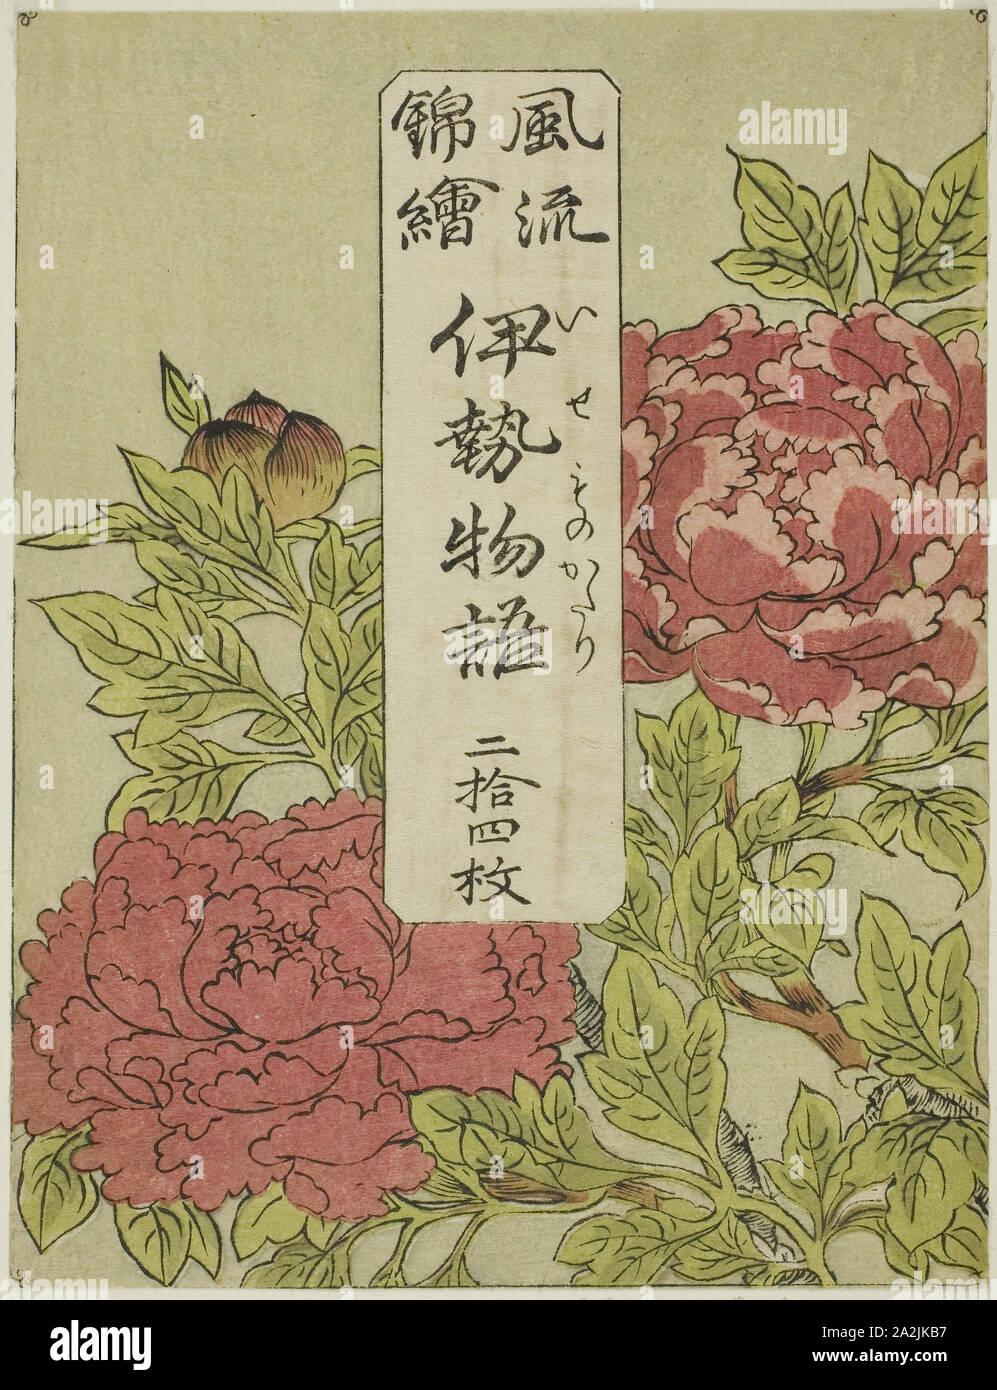 Contenedor para la serie Color-Printed Furyu nishiki-e Ise Monogatori, c. 1772/73, Katsukawa Shunsho 勝川 春章, Japonés, 1726-1792, Japón, grabado en madera de color, total: 63,5 x 40,8 cm (25 x 16 1/16 pulg.), Imagen: 17.5 x 13.5 cm (6 7/8 x 5 5/16 pulg. Foto de stock